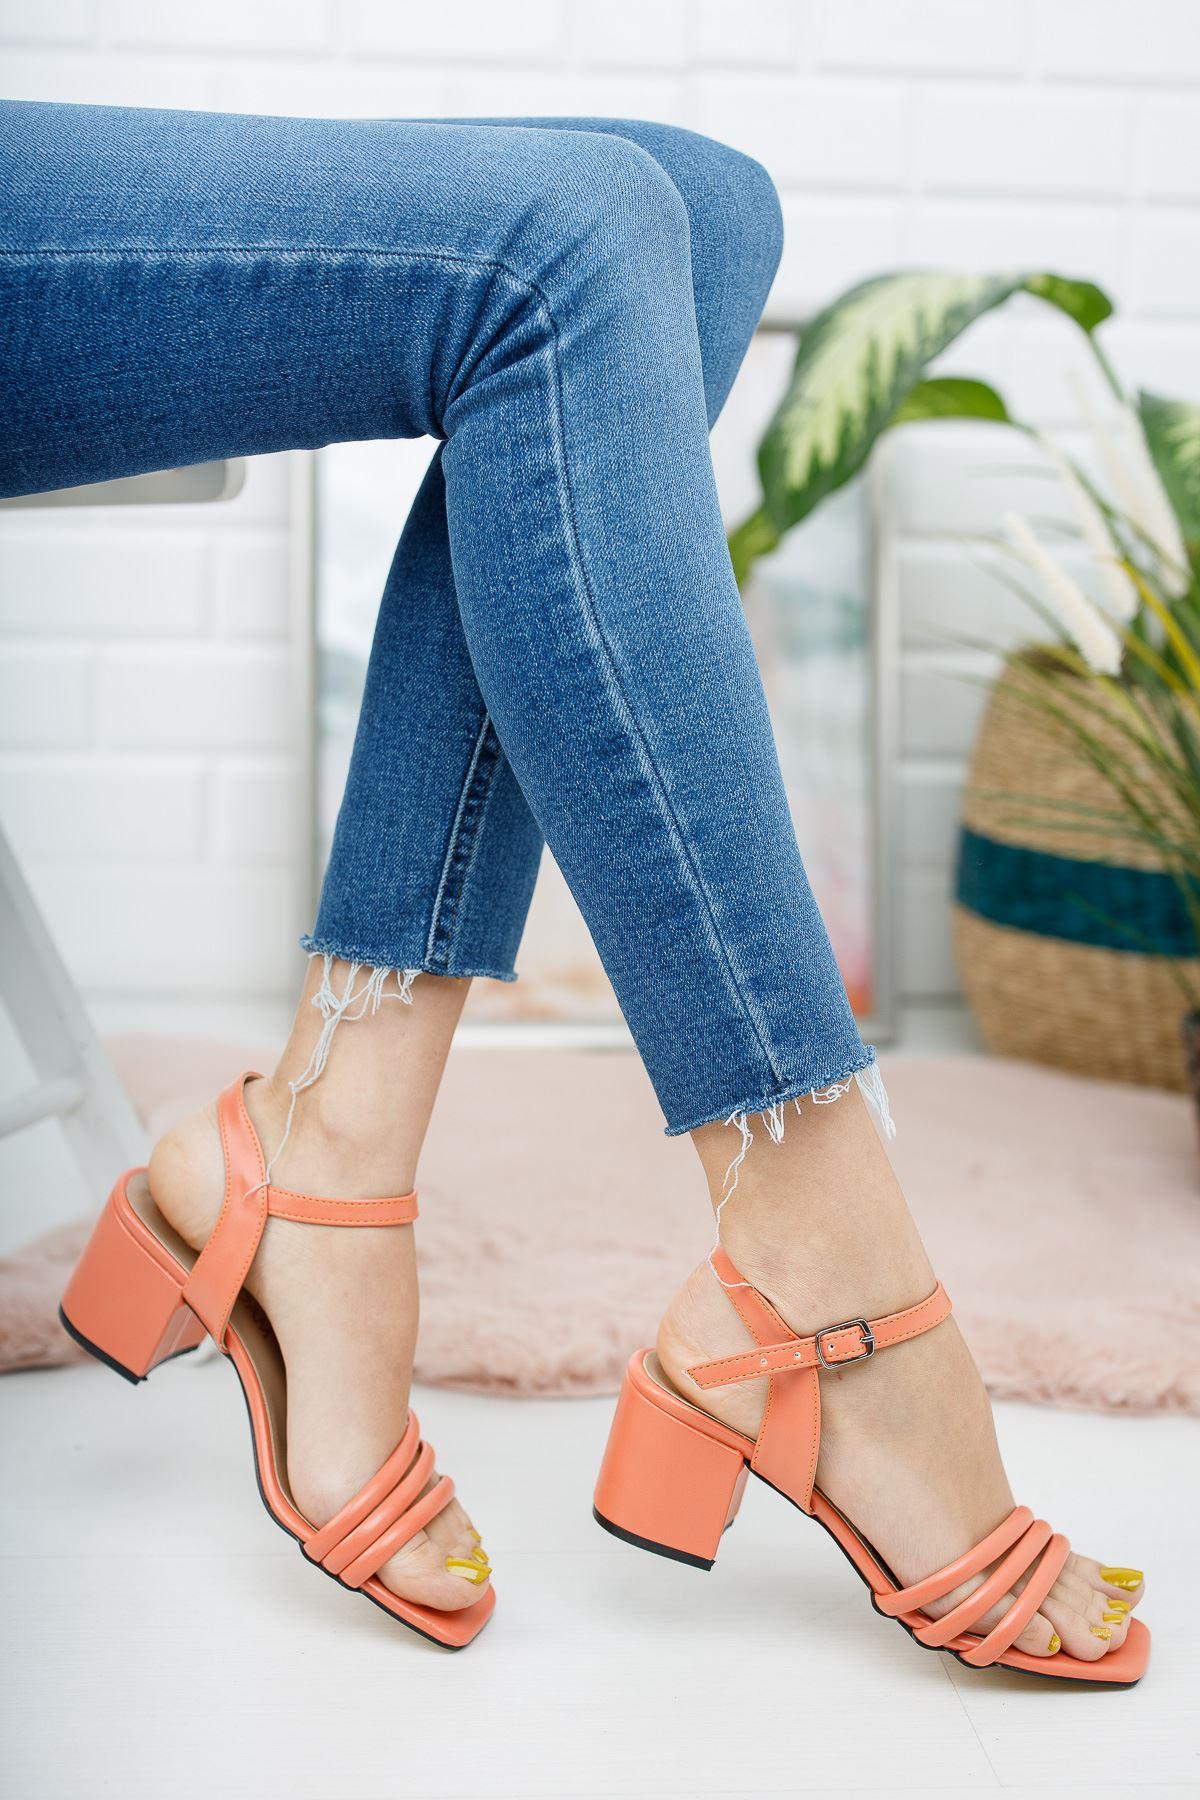 Kadın Holla Kısa Topuklu Mat Deri Turuncu Ayakkabı